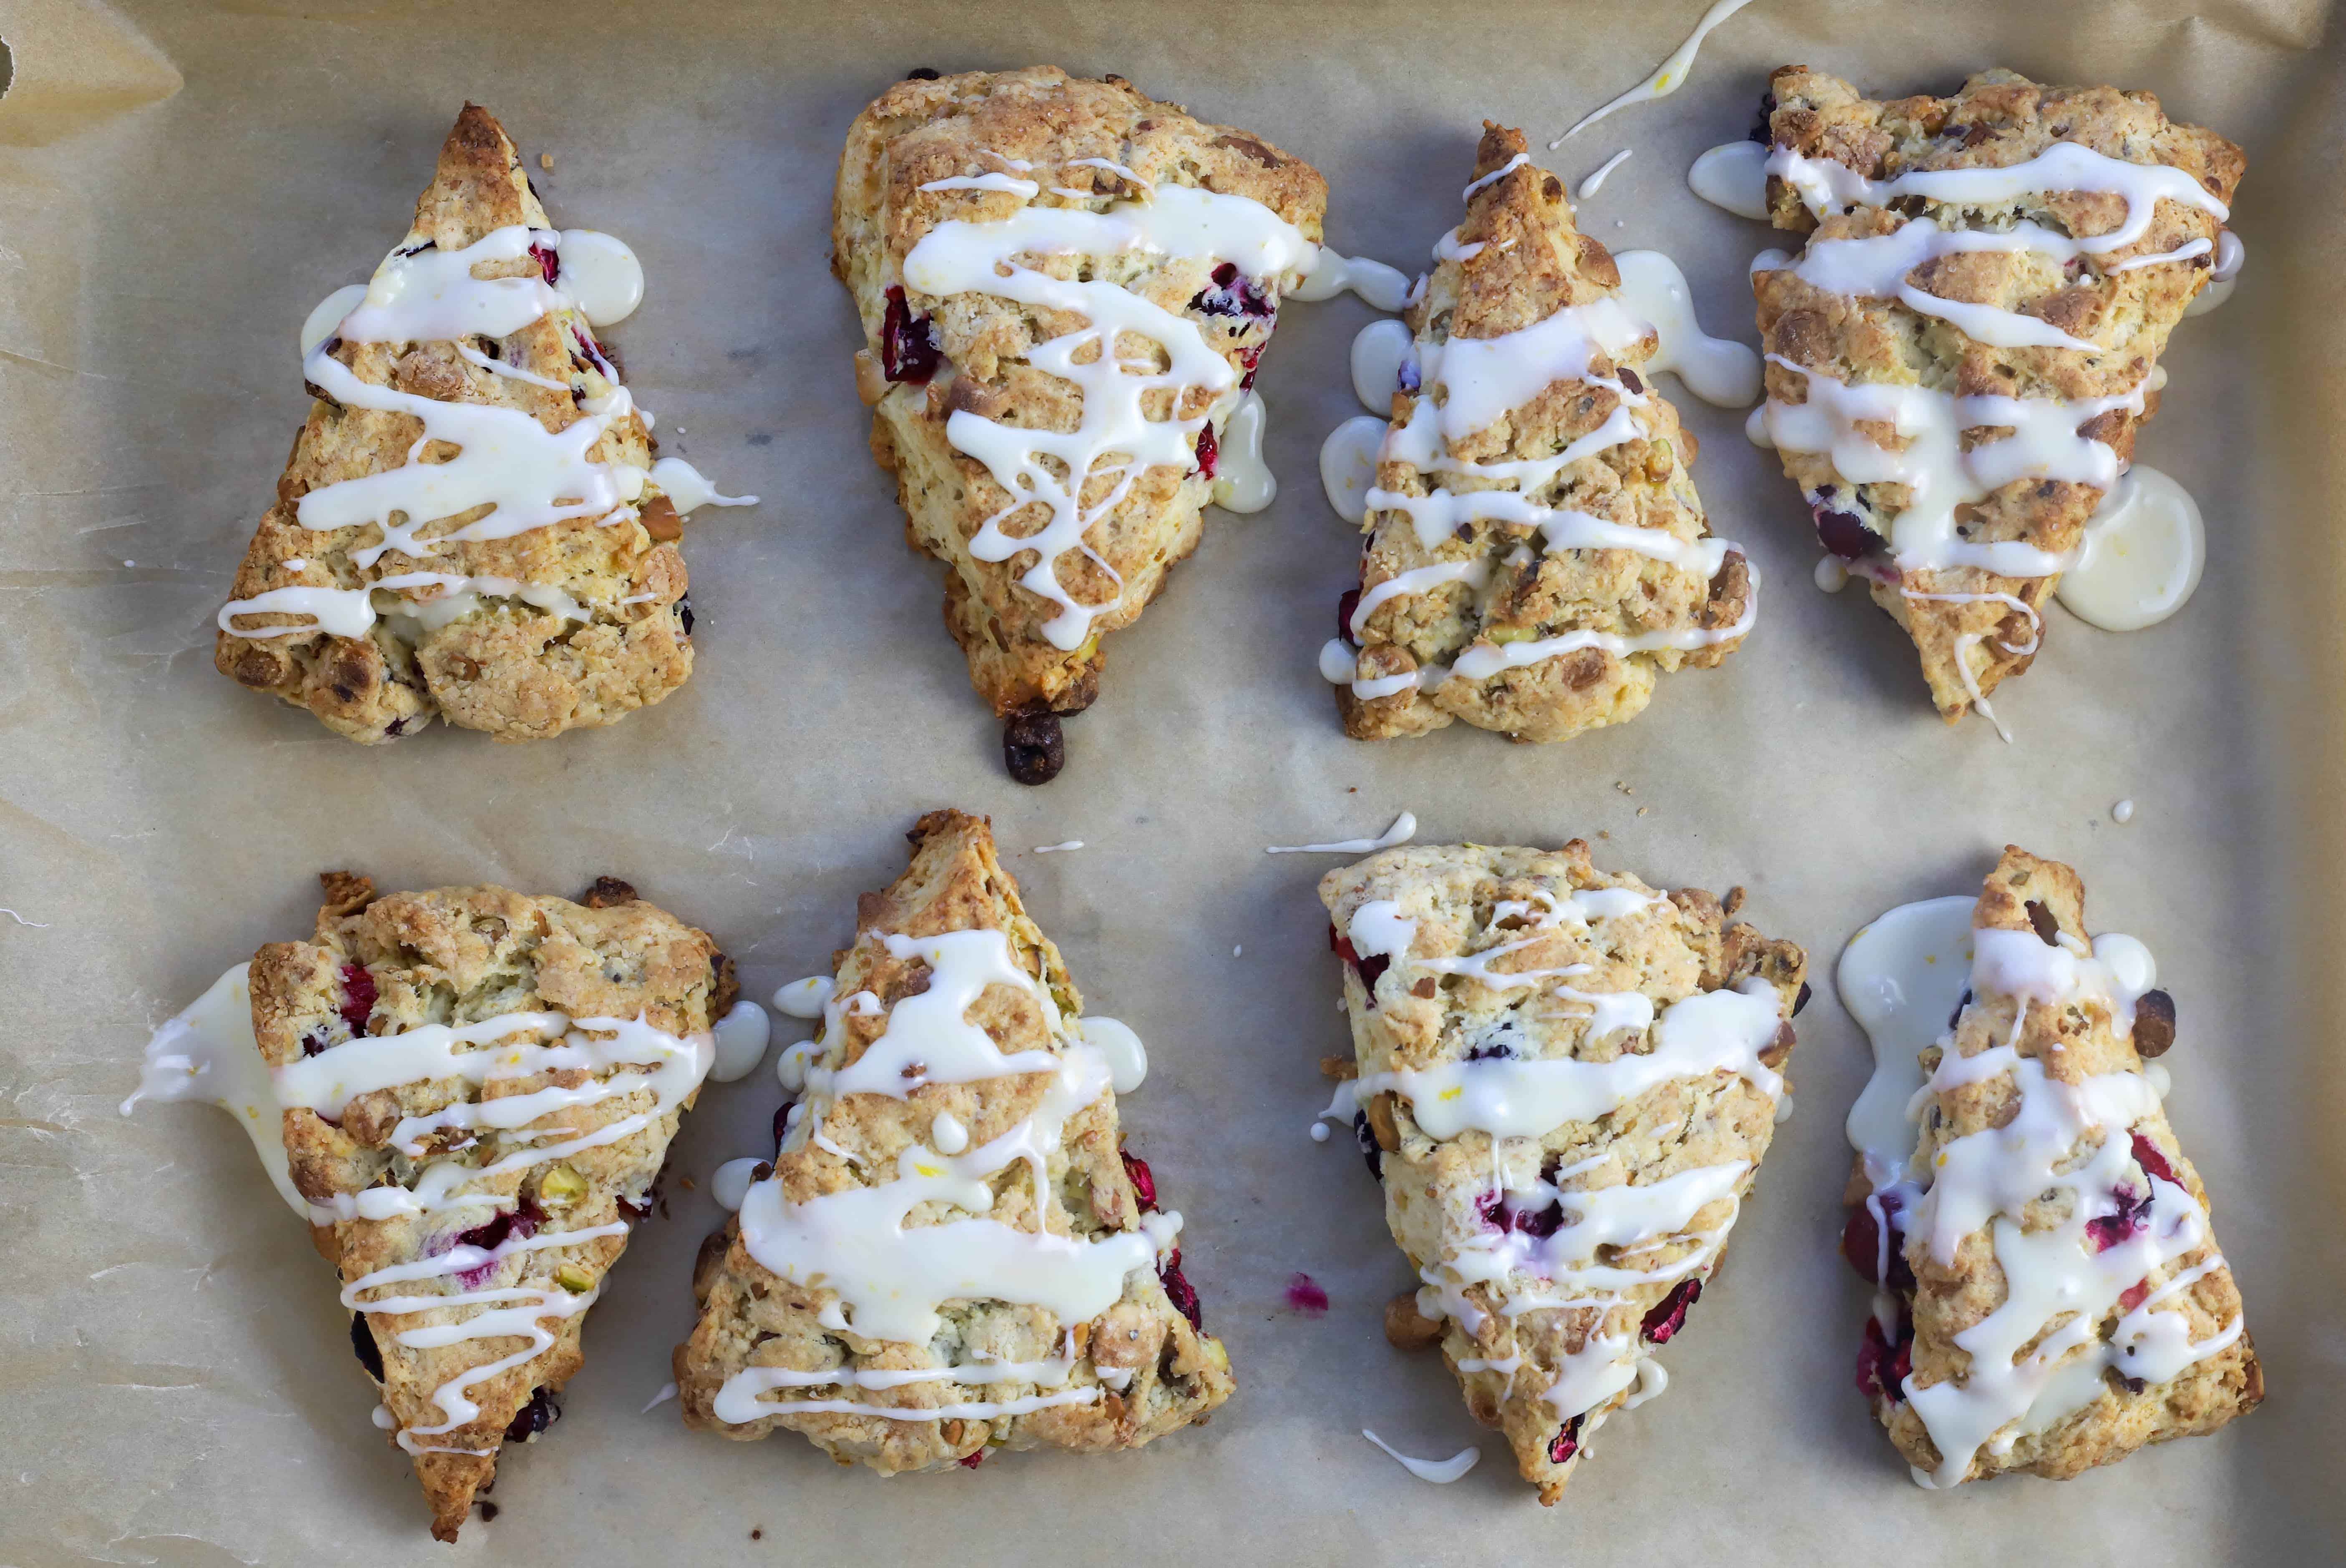 eight baked pistachio scones with orange glaze added on top